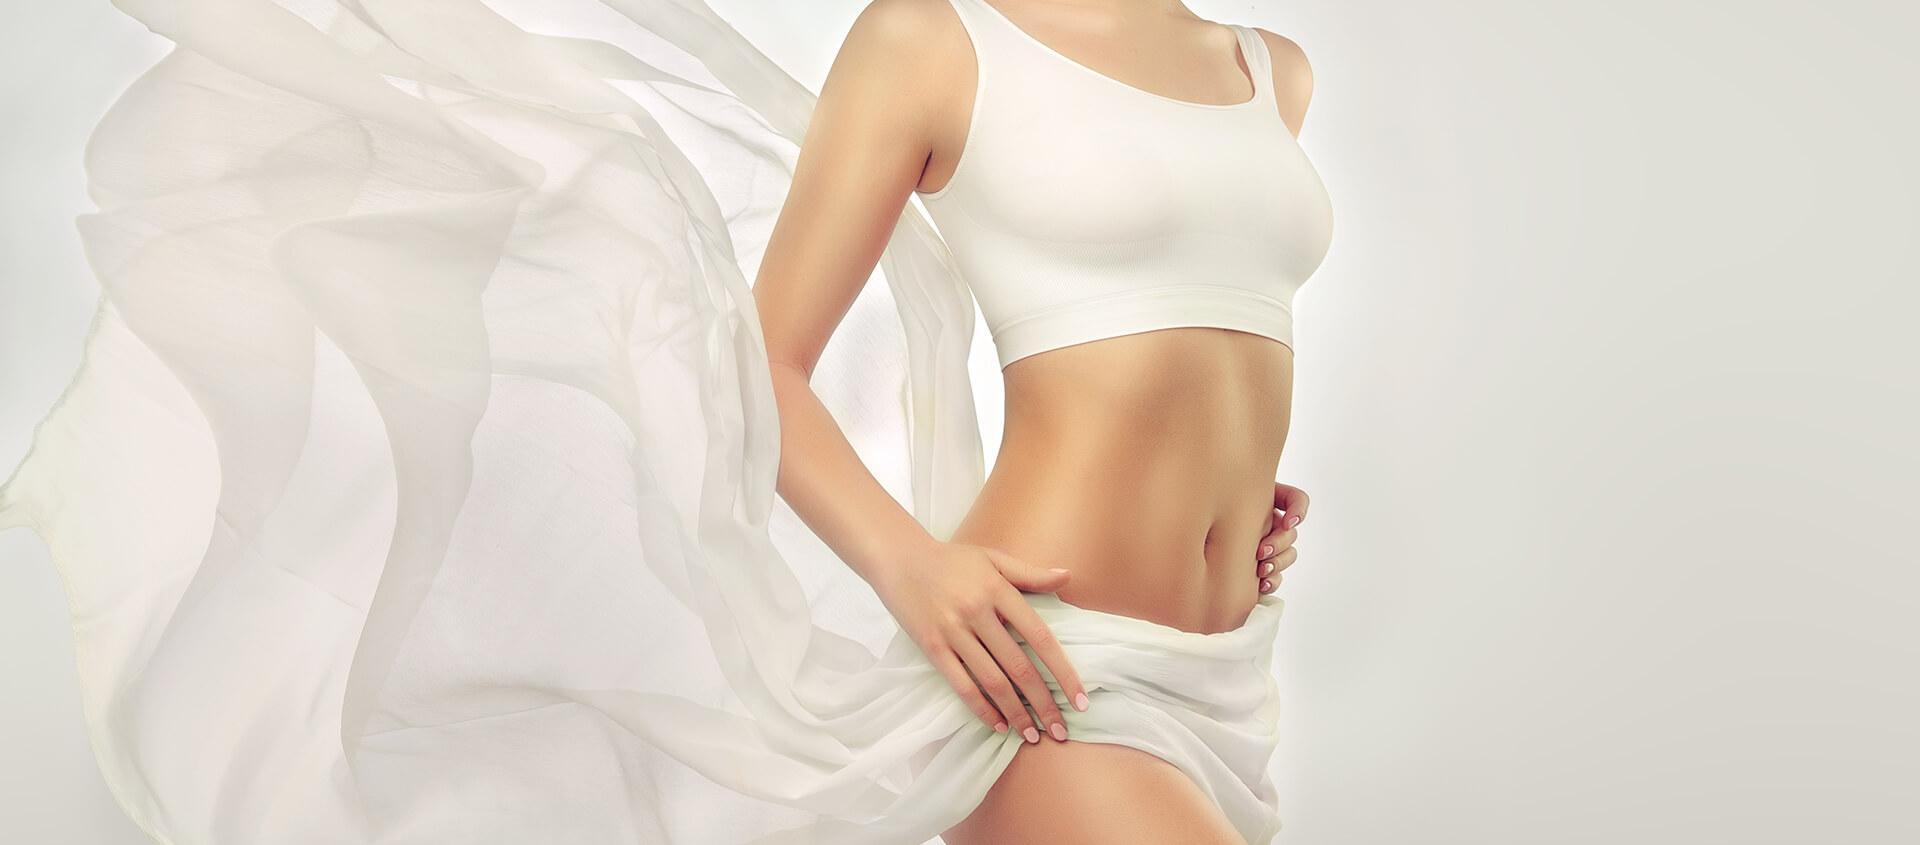 Mark H. Tseng, M.D. Blog | Redefine your look with a plastic surgeon near Bellevue, WA